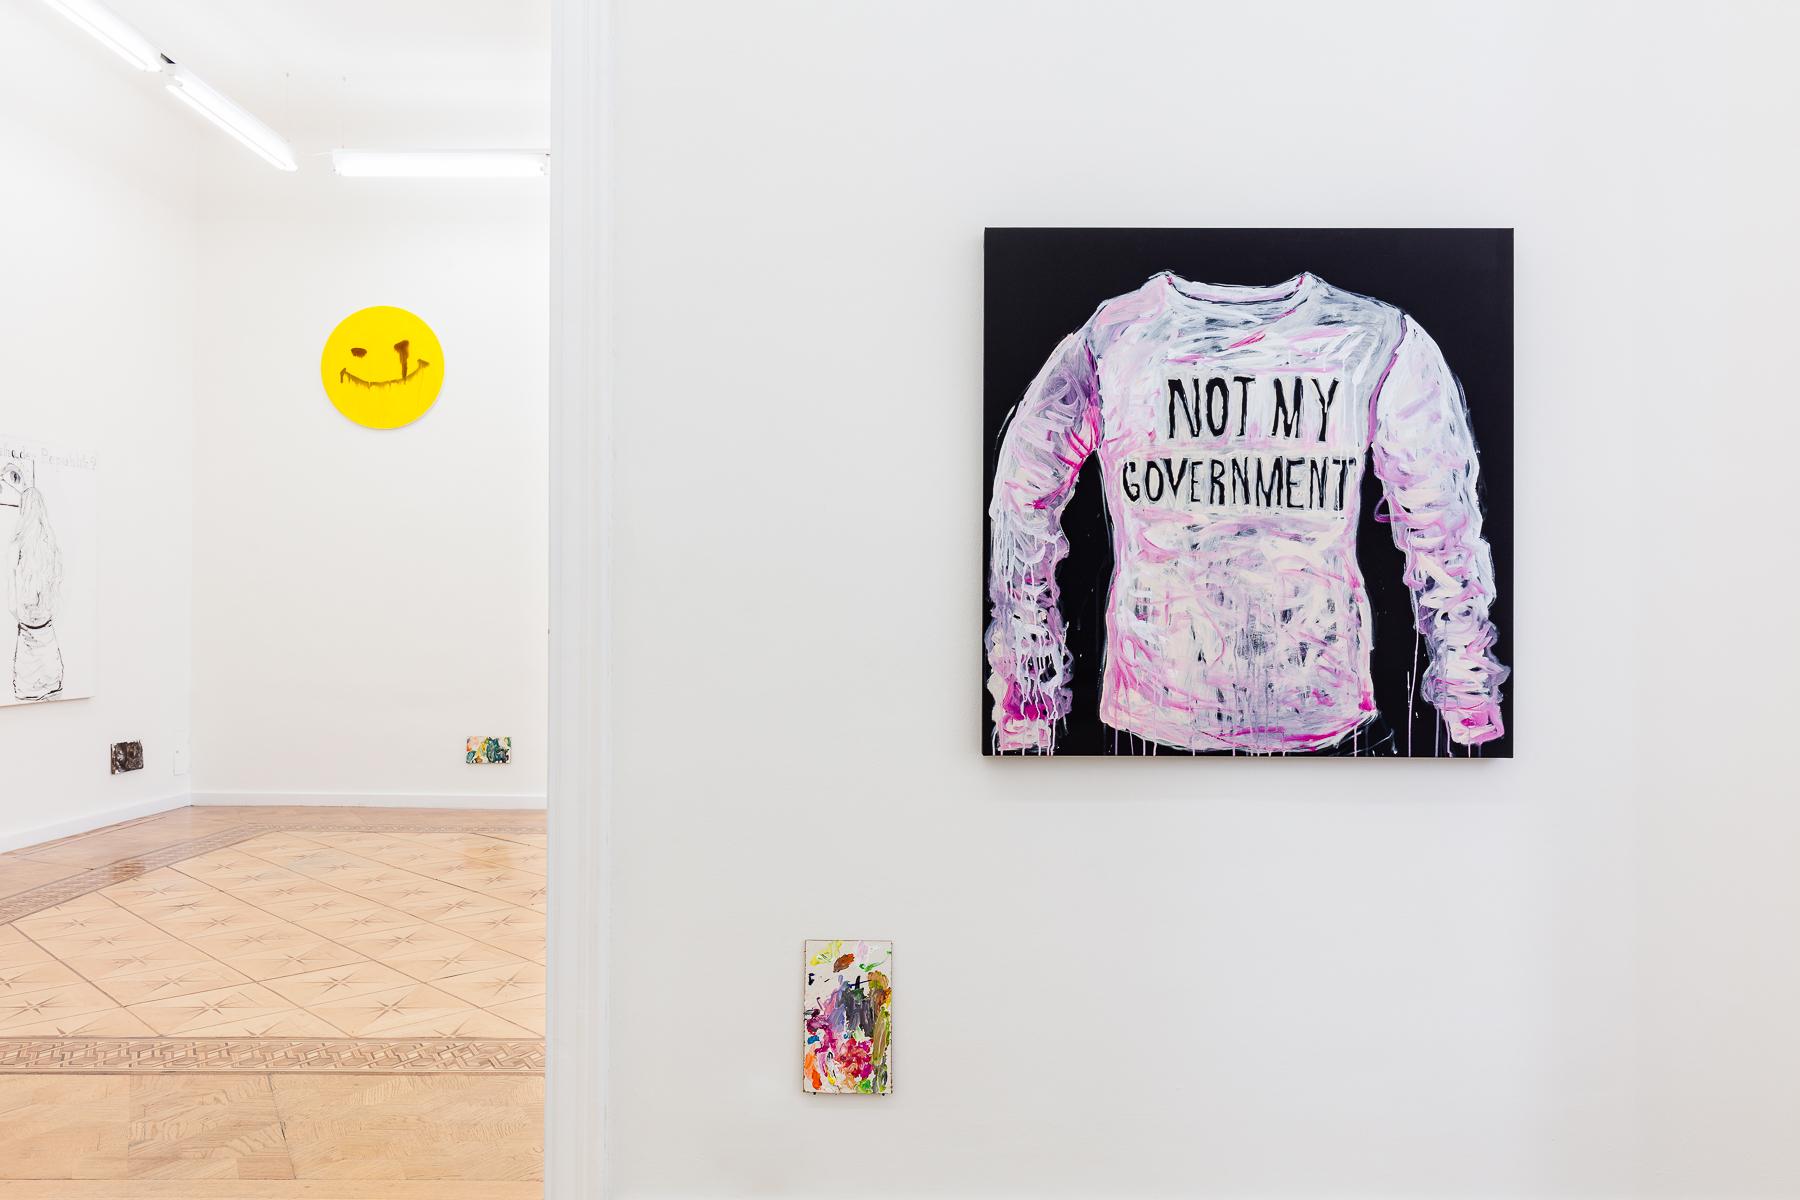 2019_05_20_Elke-Krystufek_Croy-Nielsen_by-kunst-dokumentation-com_047_web.jpg